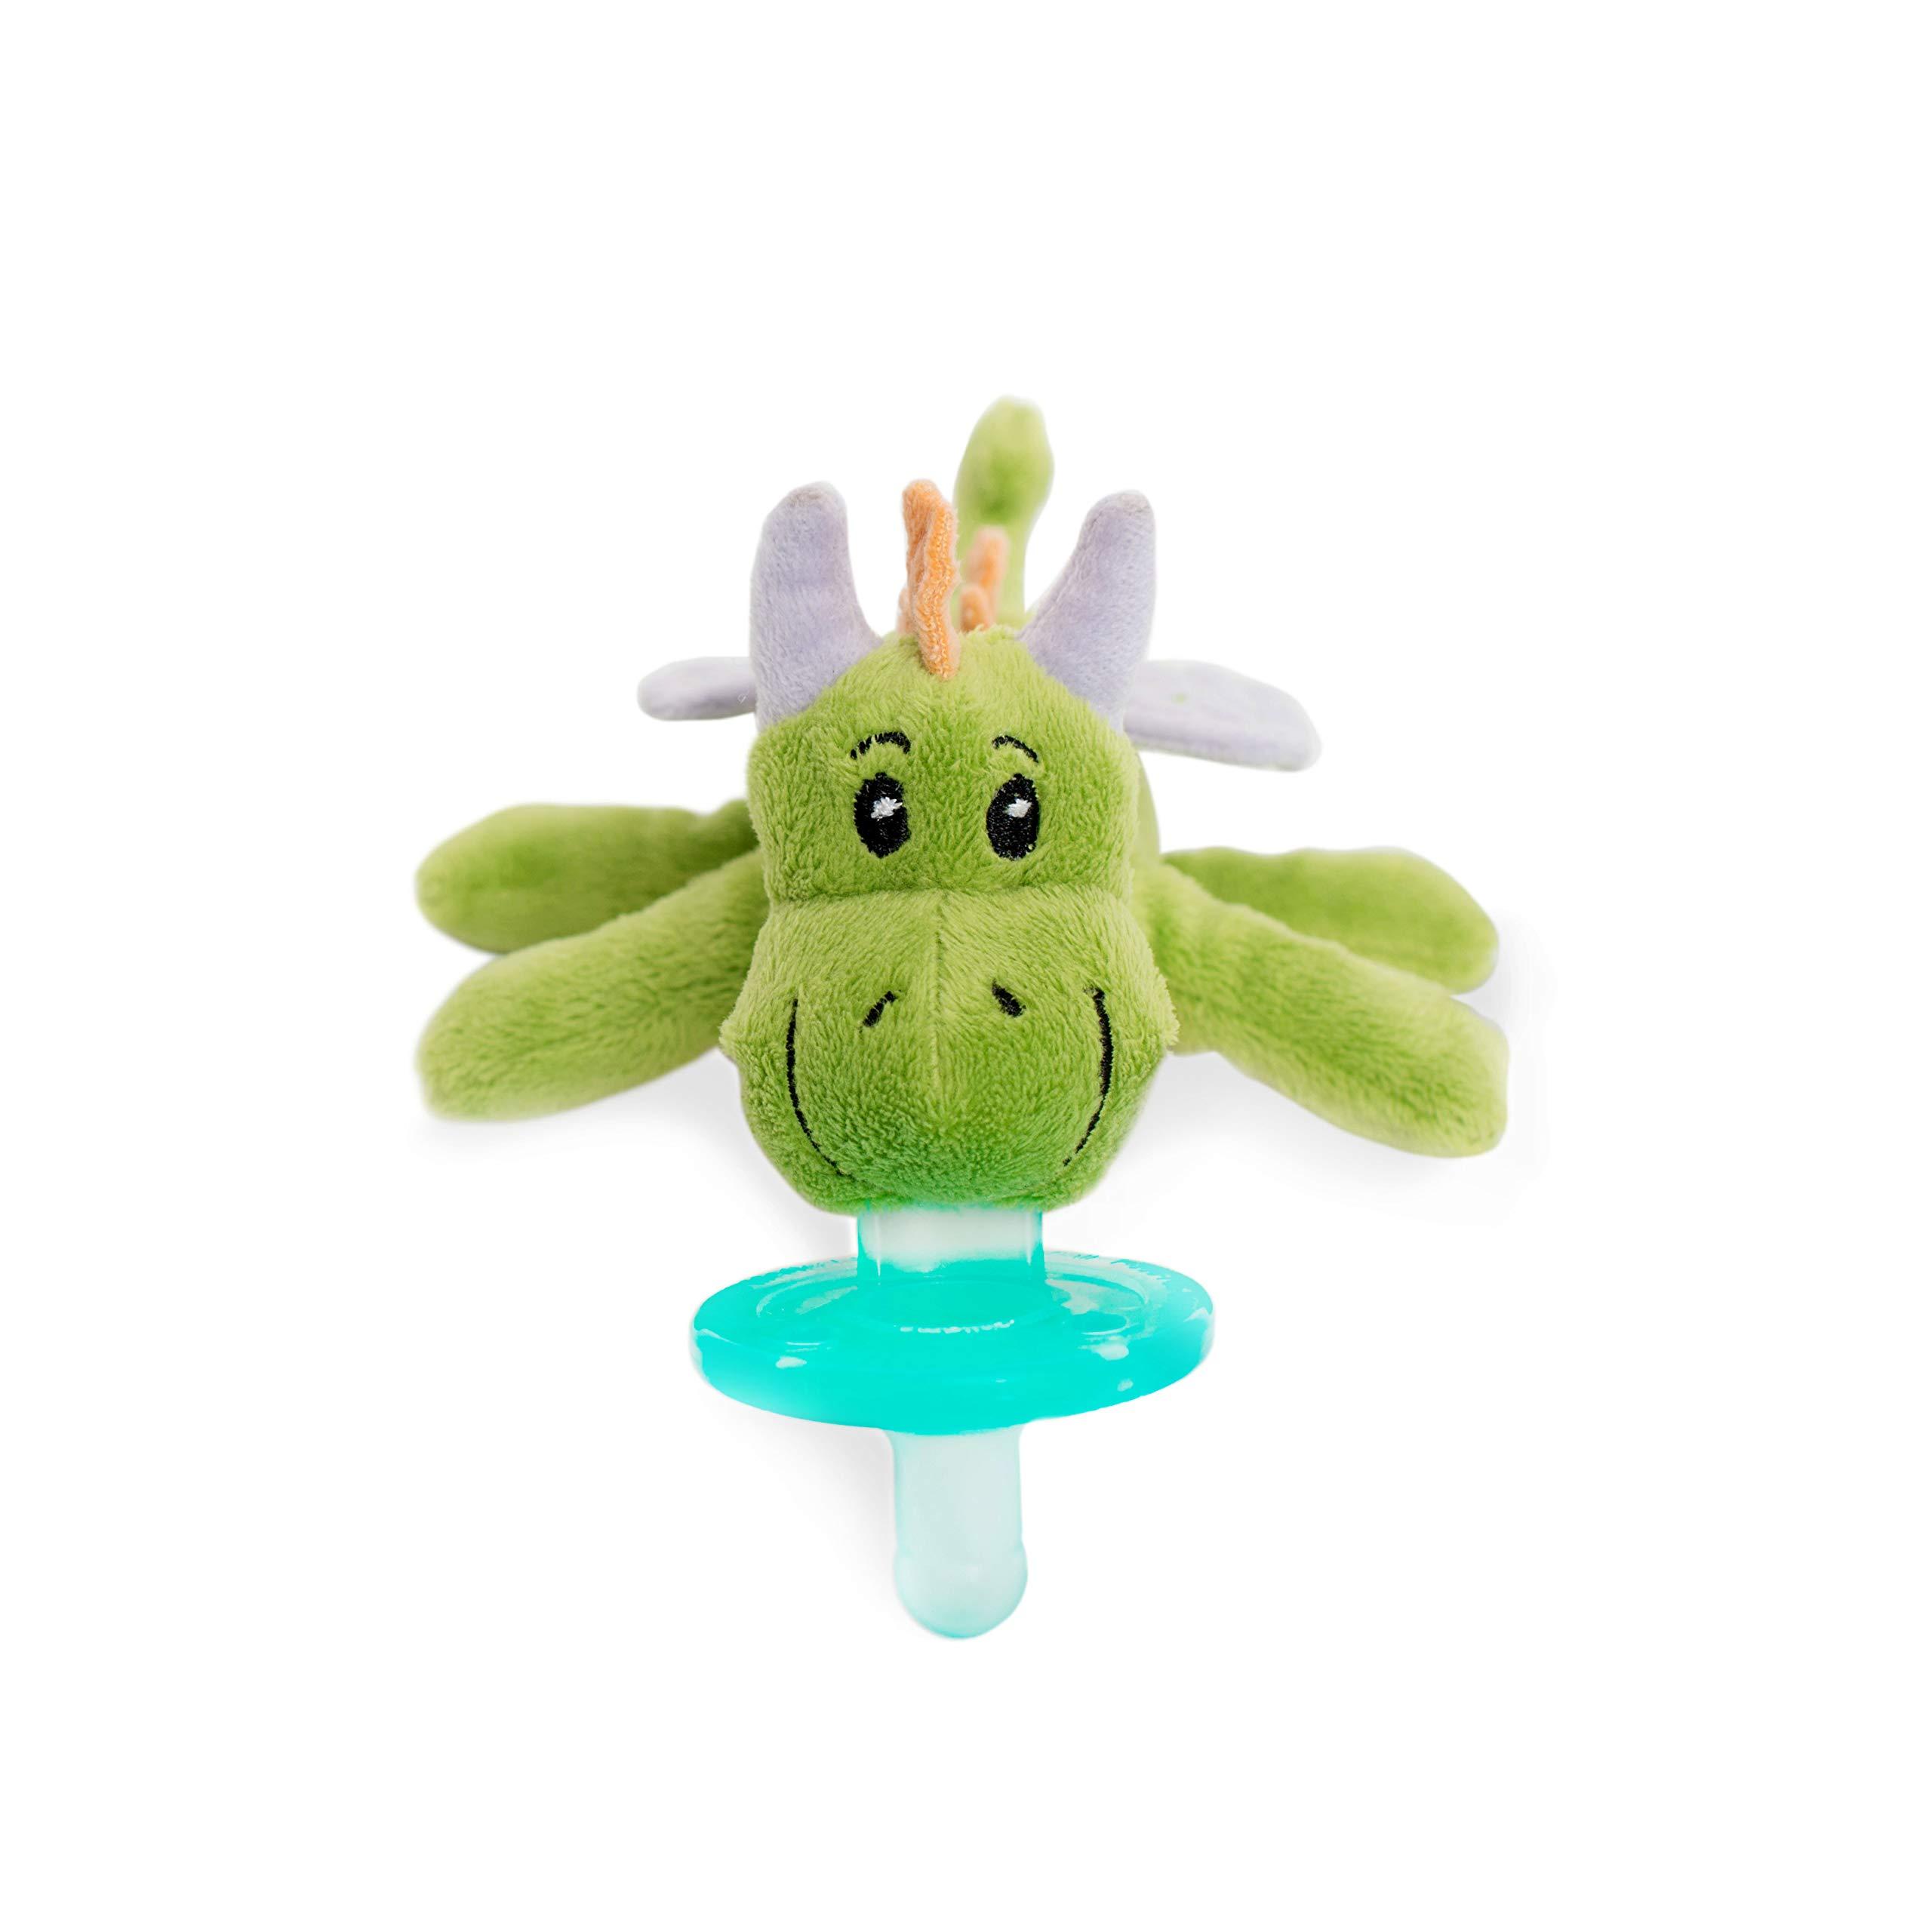 Wubbanub Infant Pacifier - Fairytale Dragon